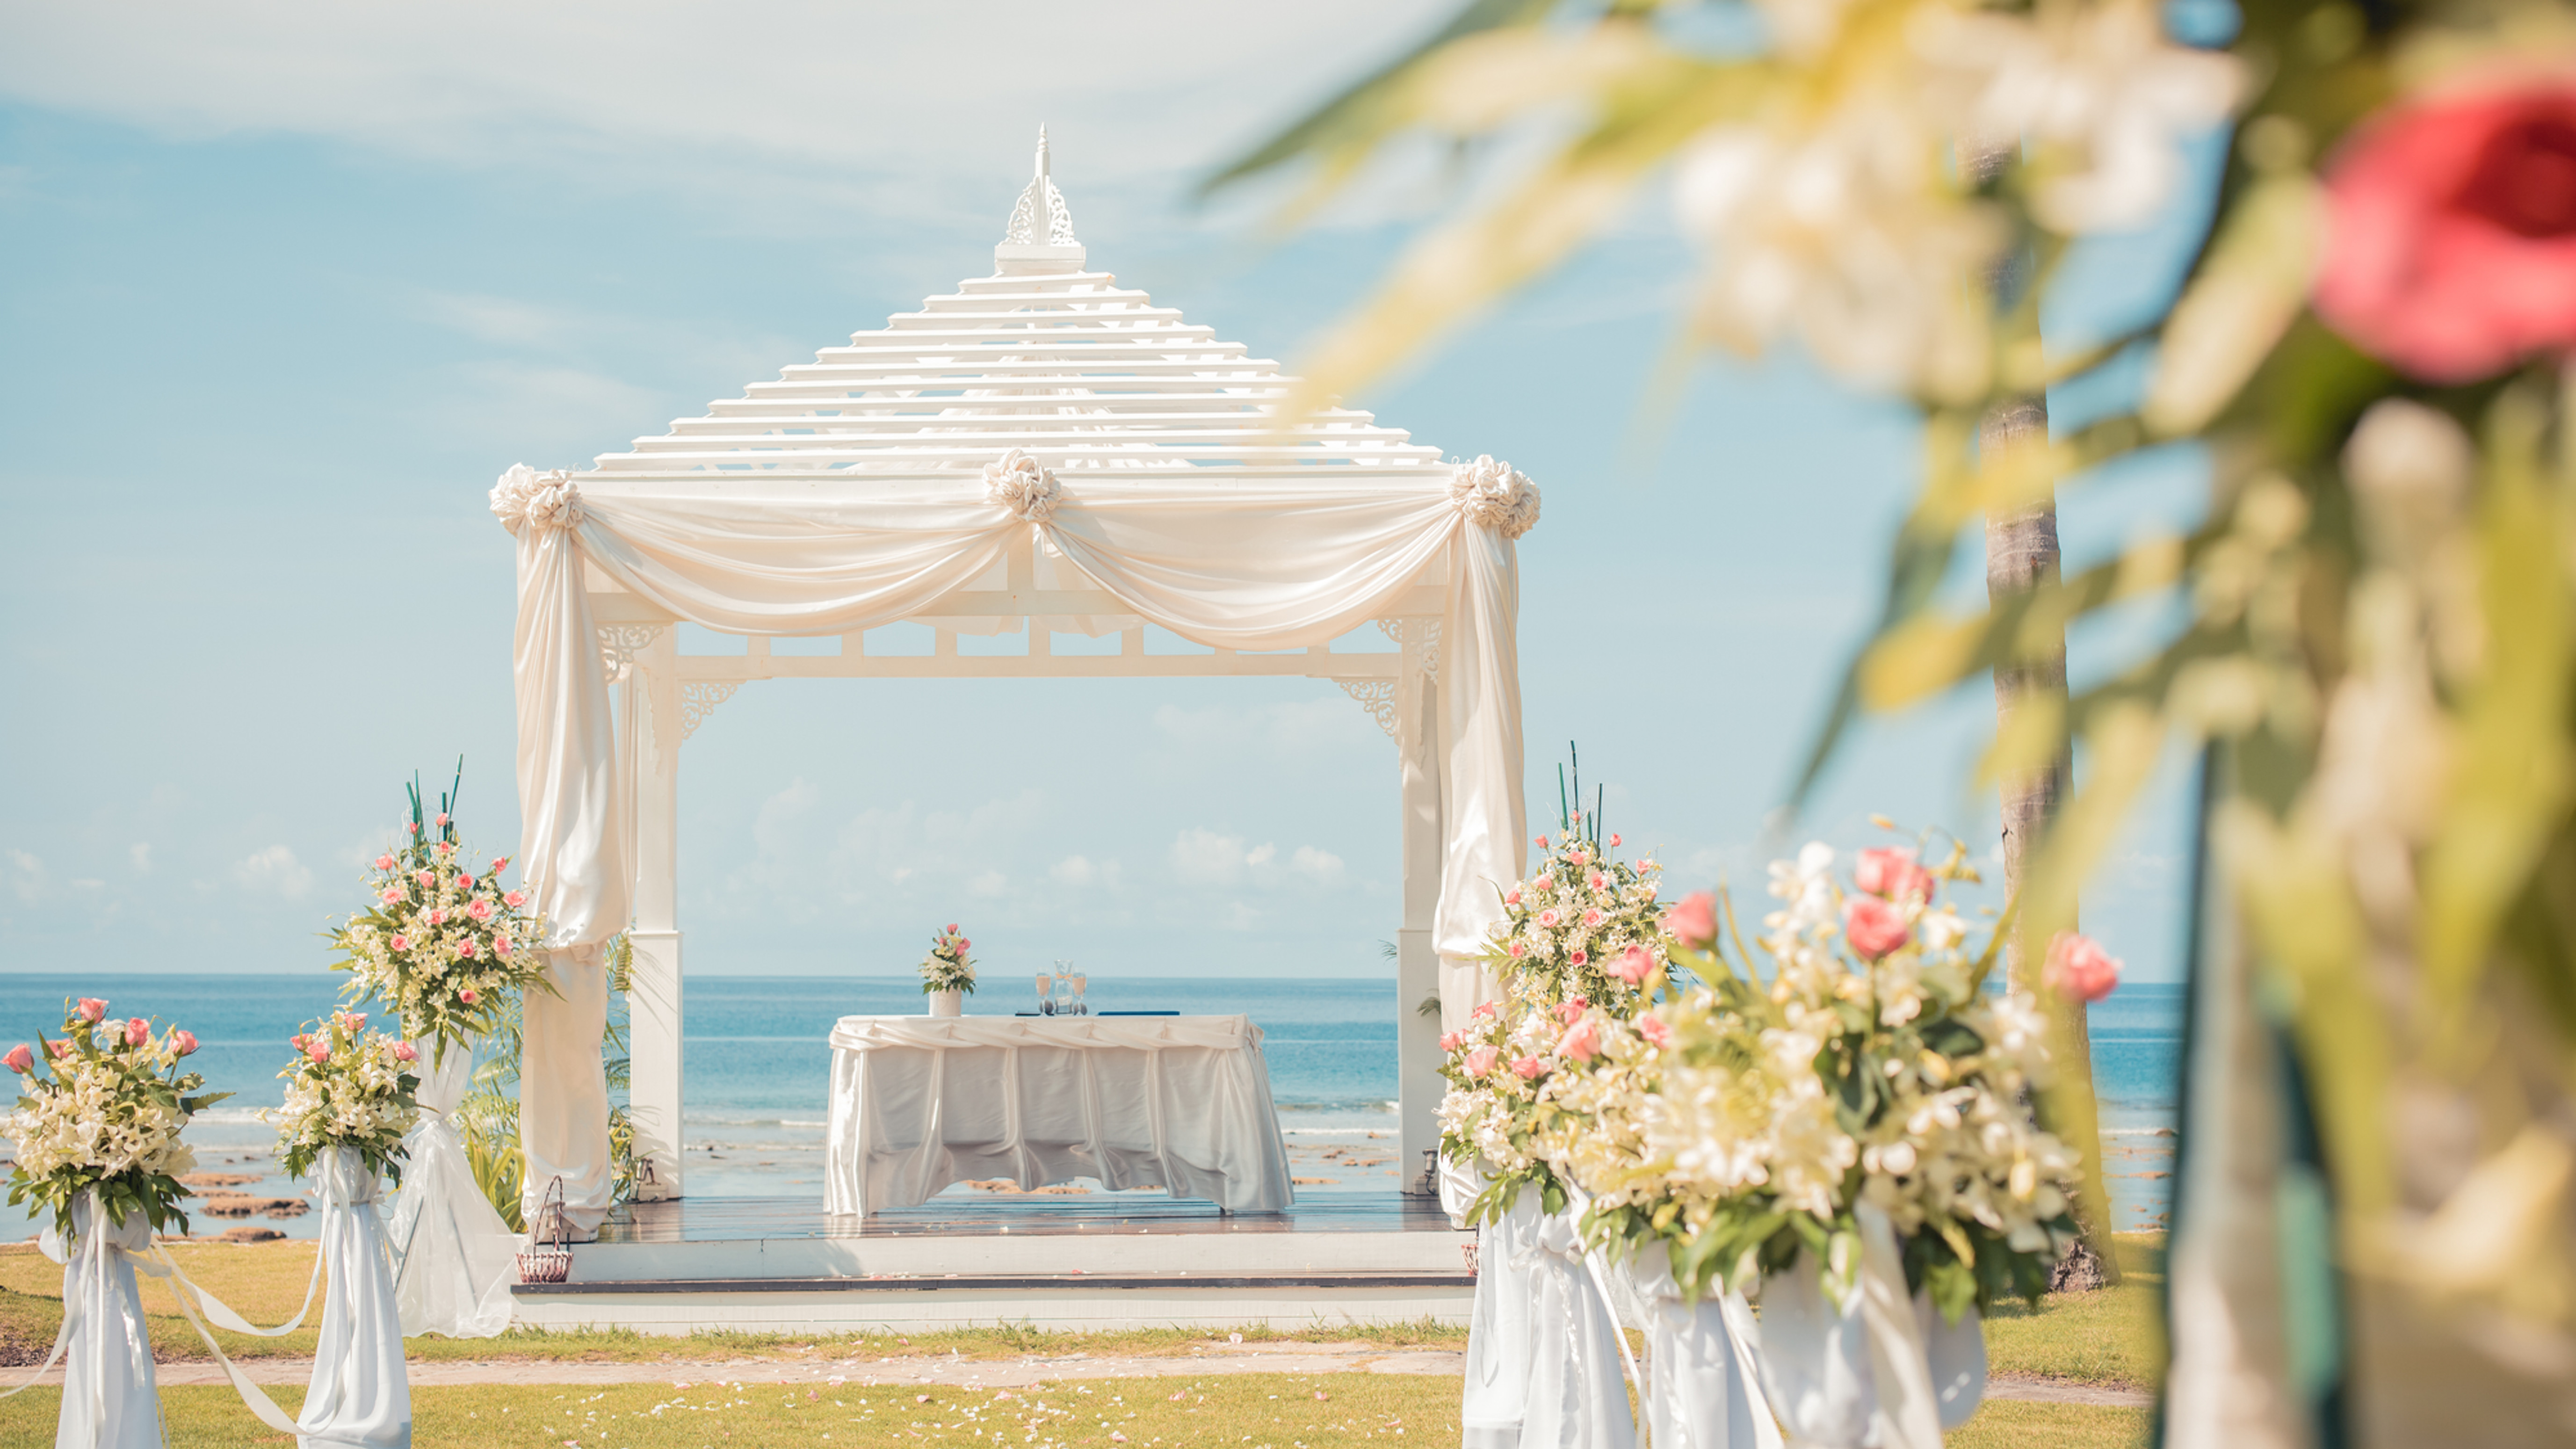 Destination Weddings - Retainer